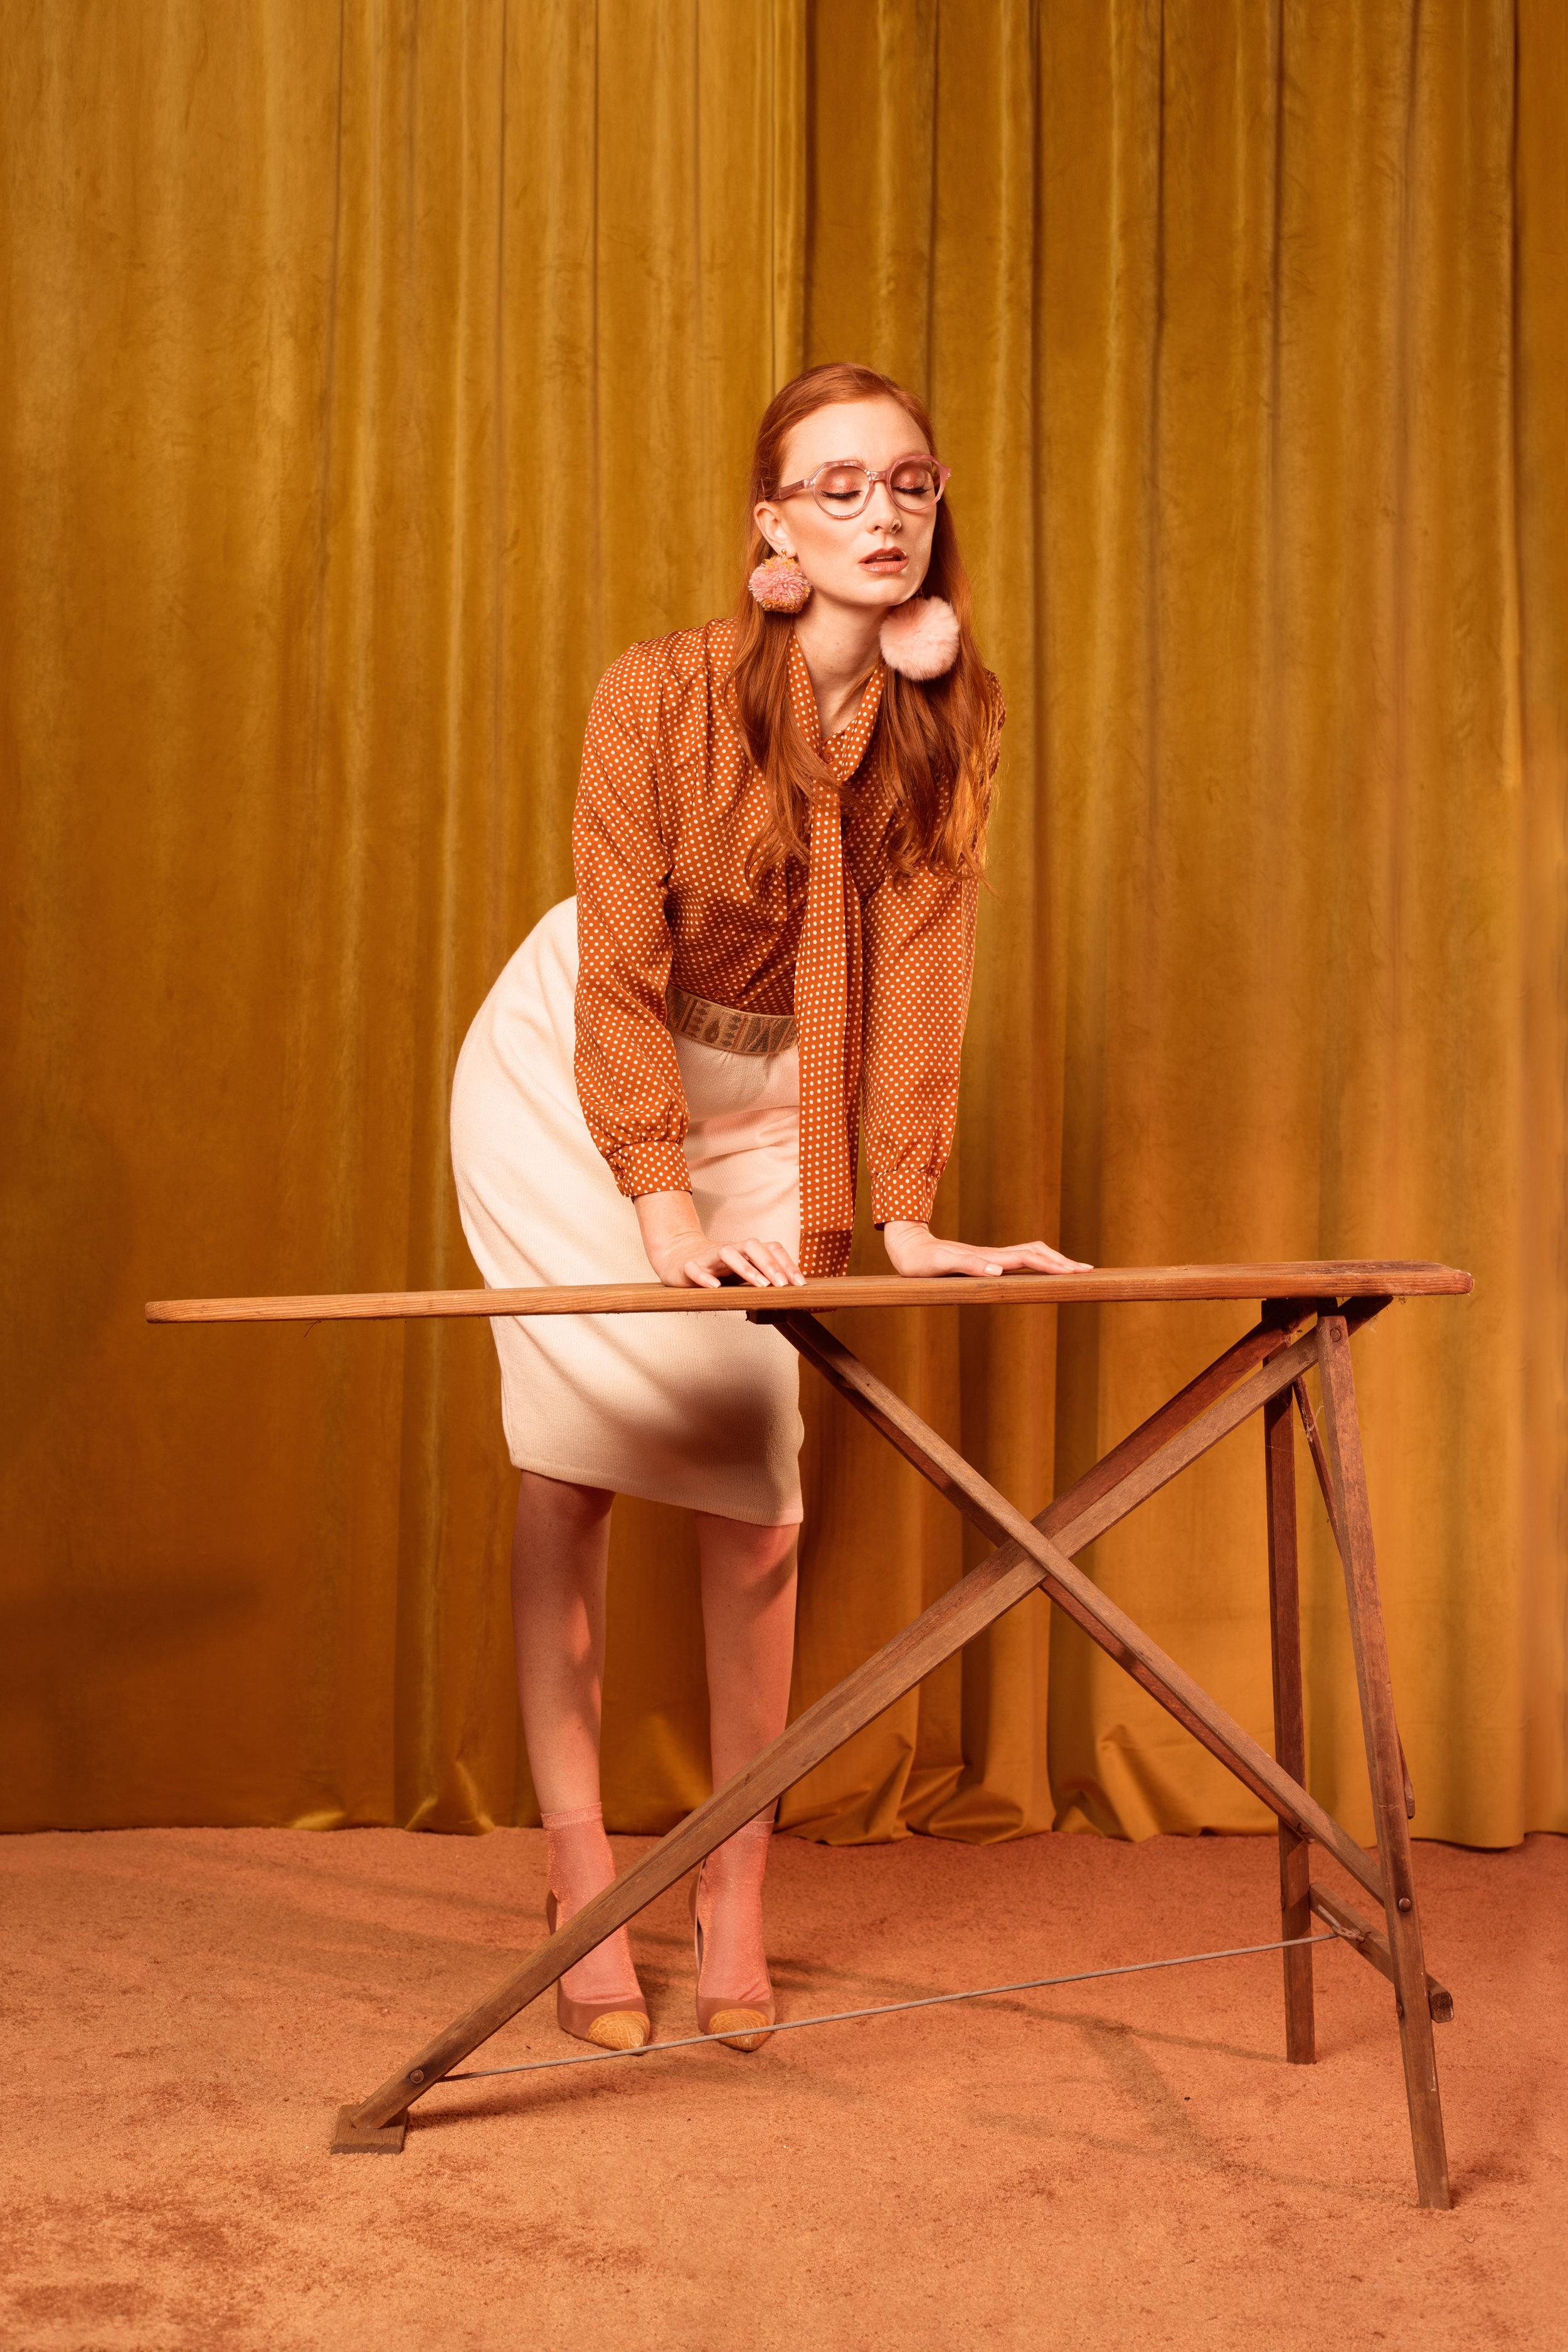 Shoes: Prada  Socks: Asos  Skirt & Shirt: Vintage  Earrings: Claire Drennan Knitwear